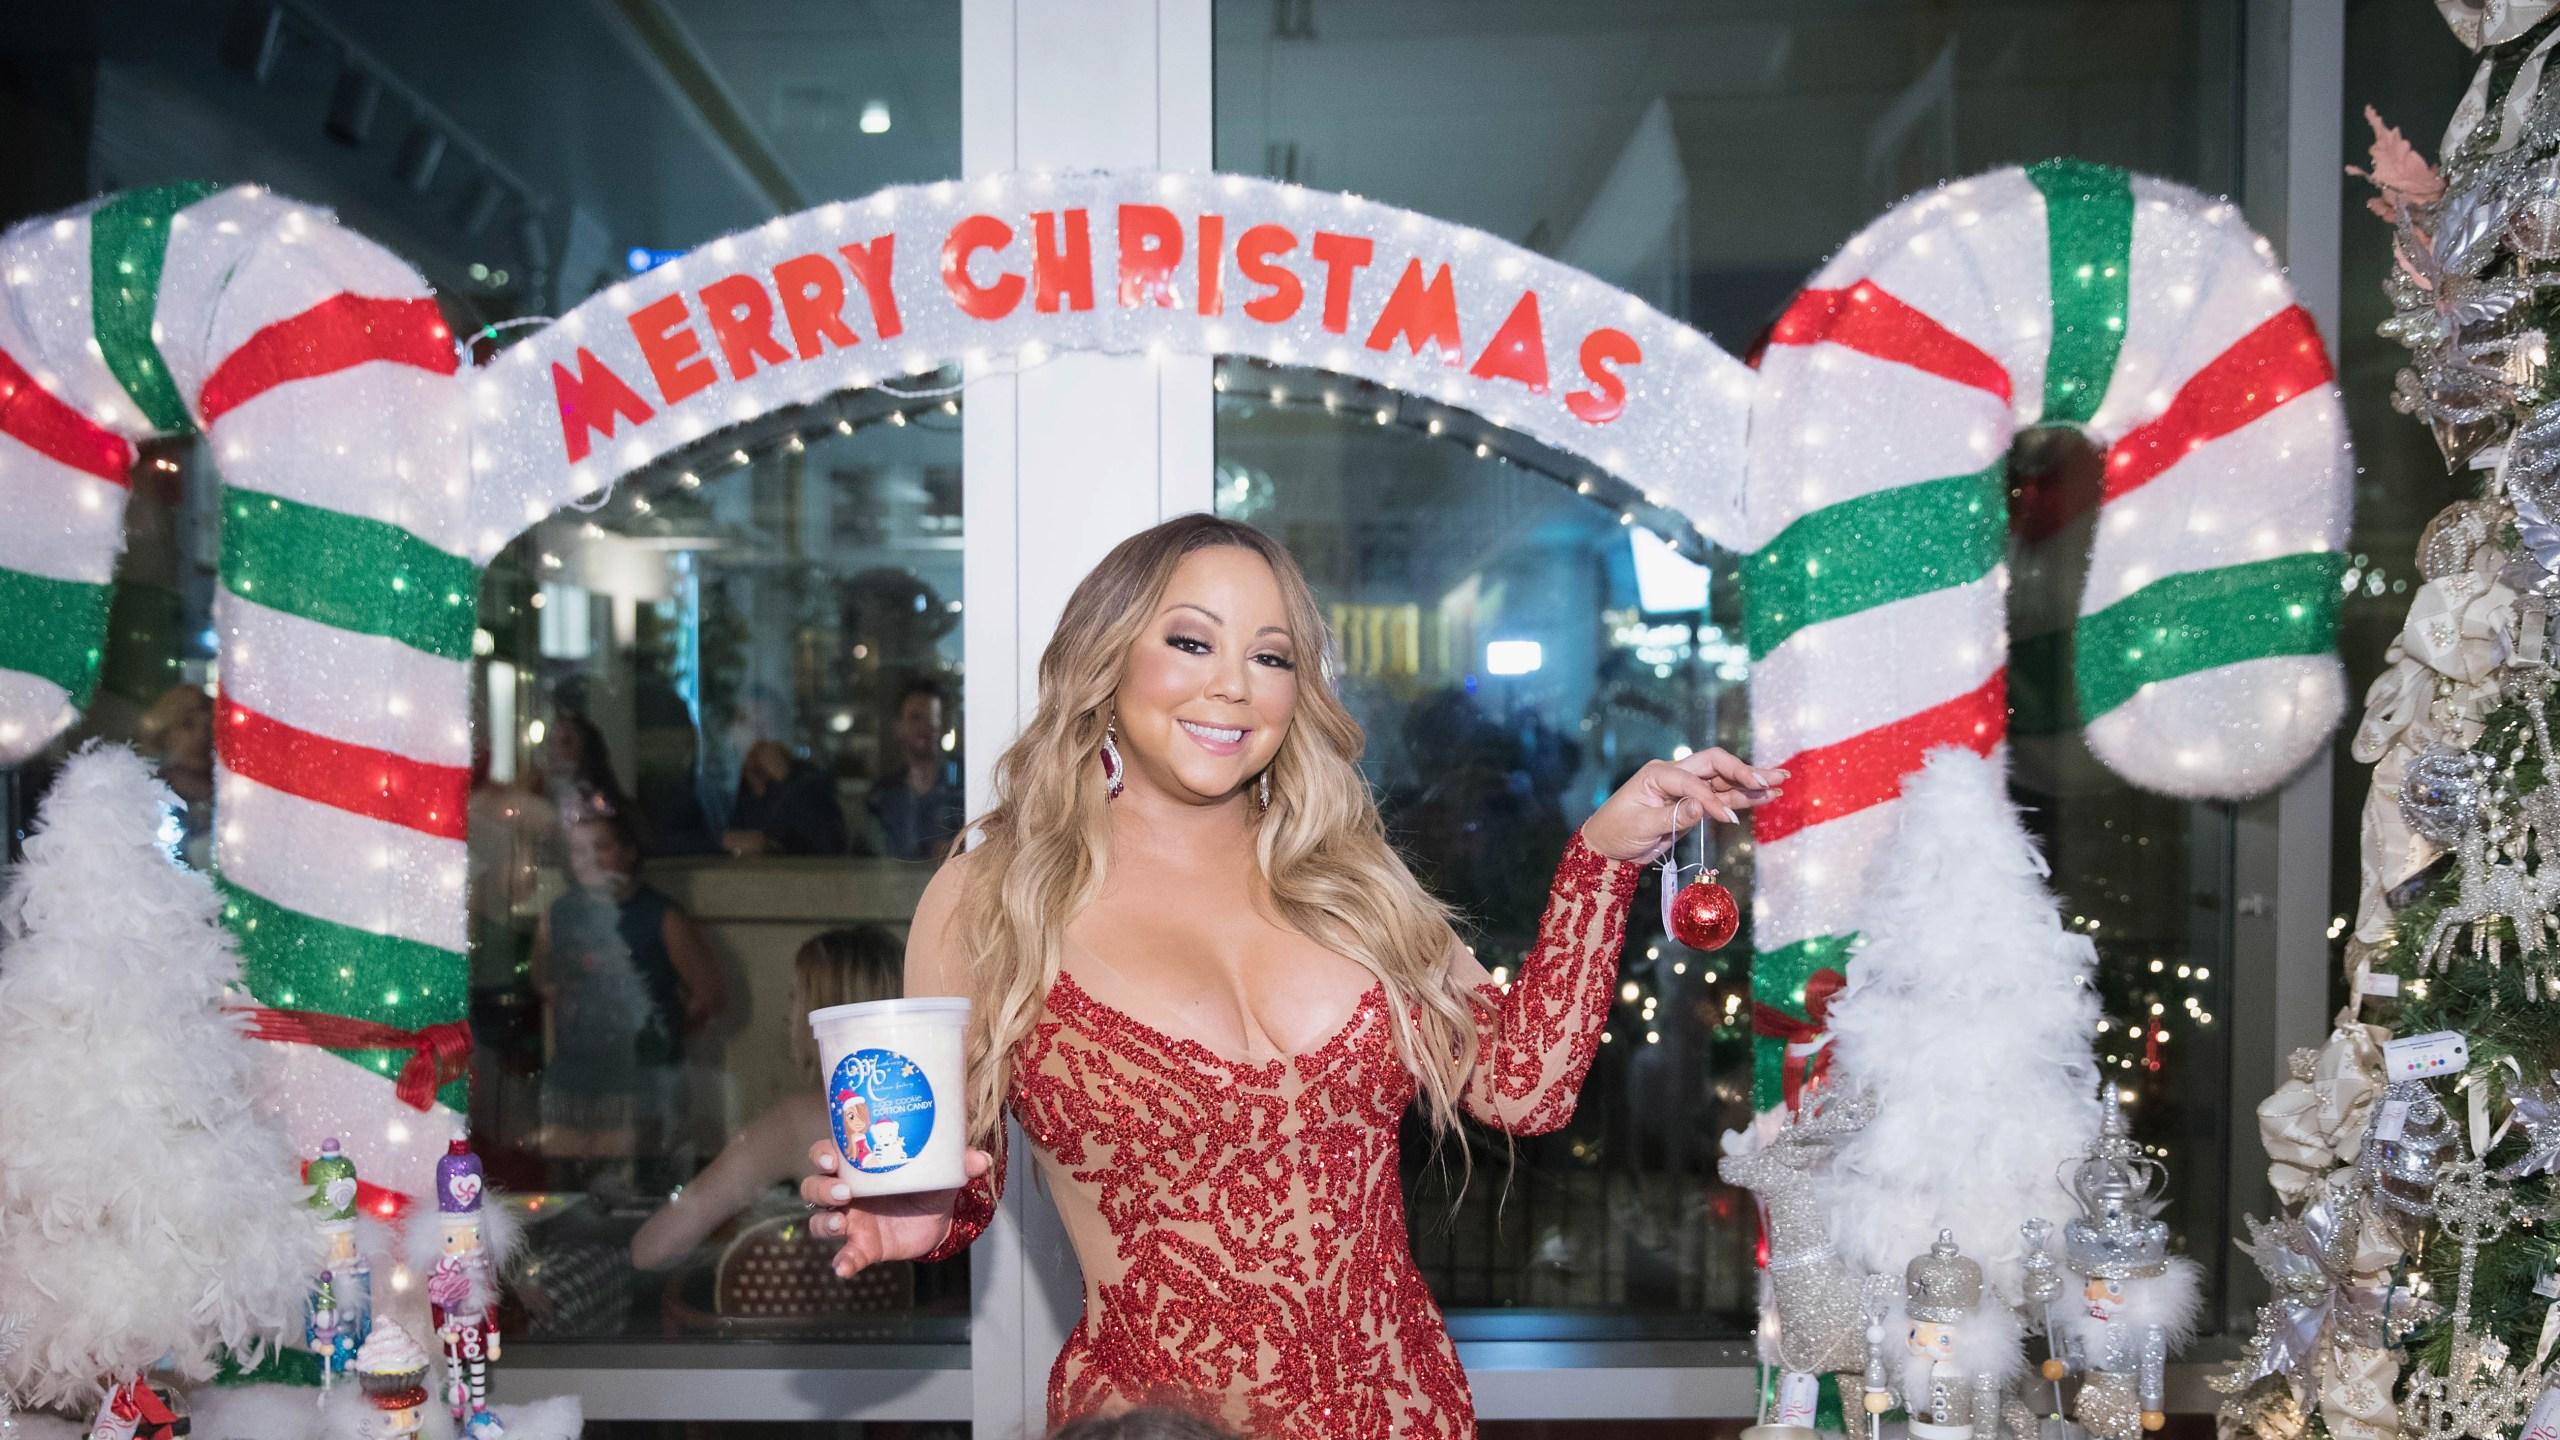 Mariah Carey Christmas.Mariah Carey Announces Merry Christmas 25th Anniversary Re